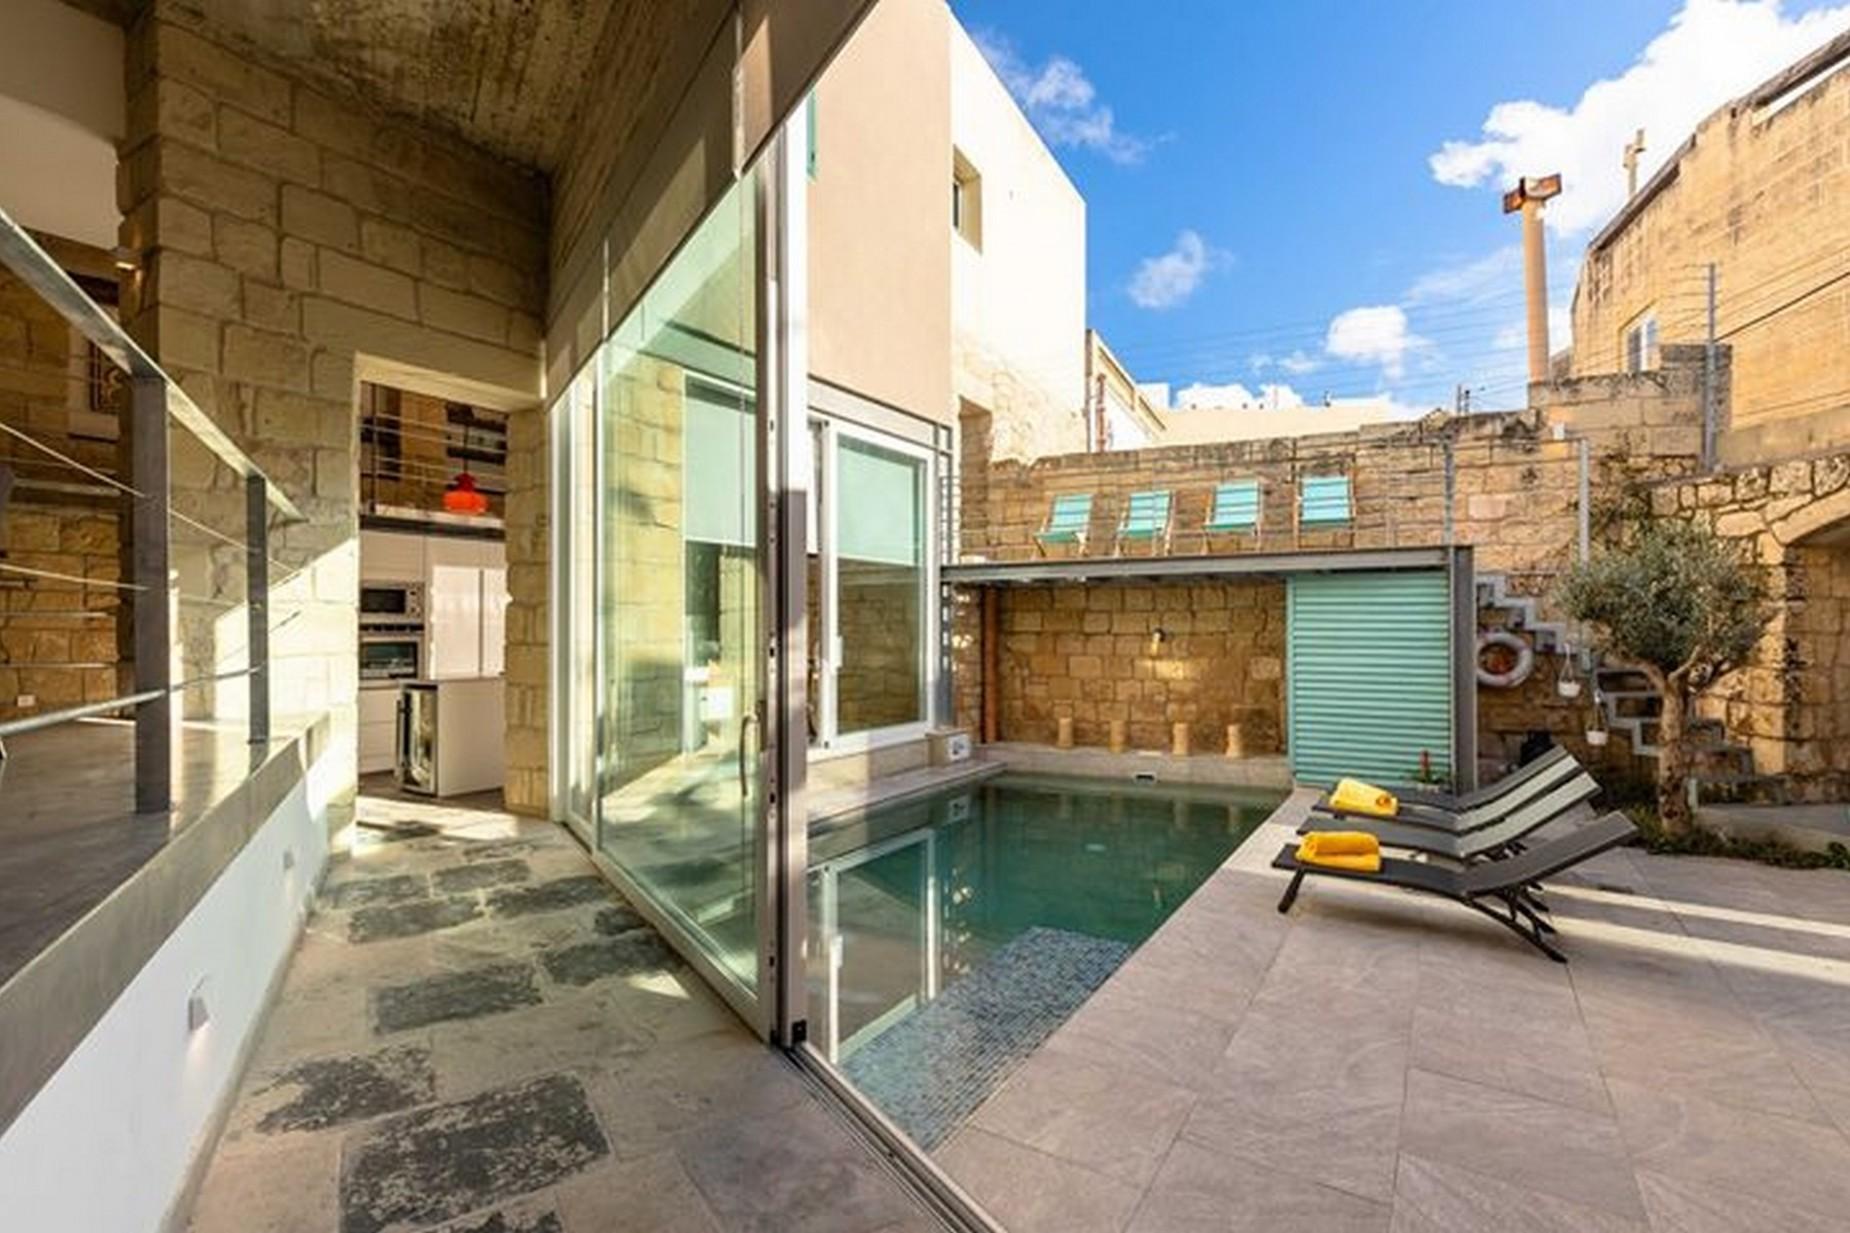 5 bed Villa For Rent in Gharghur, Gharghur - thumb 4